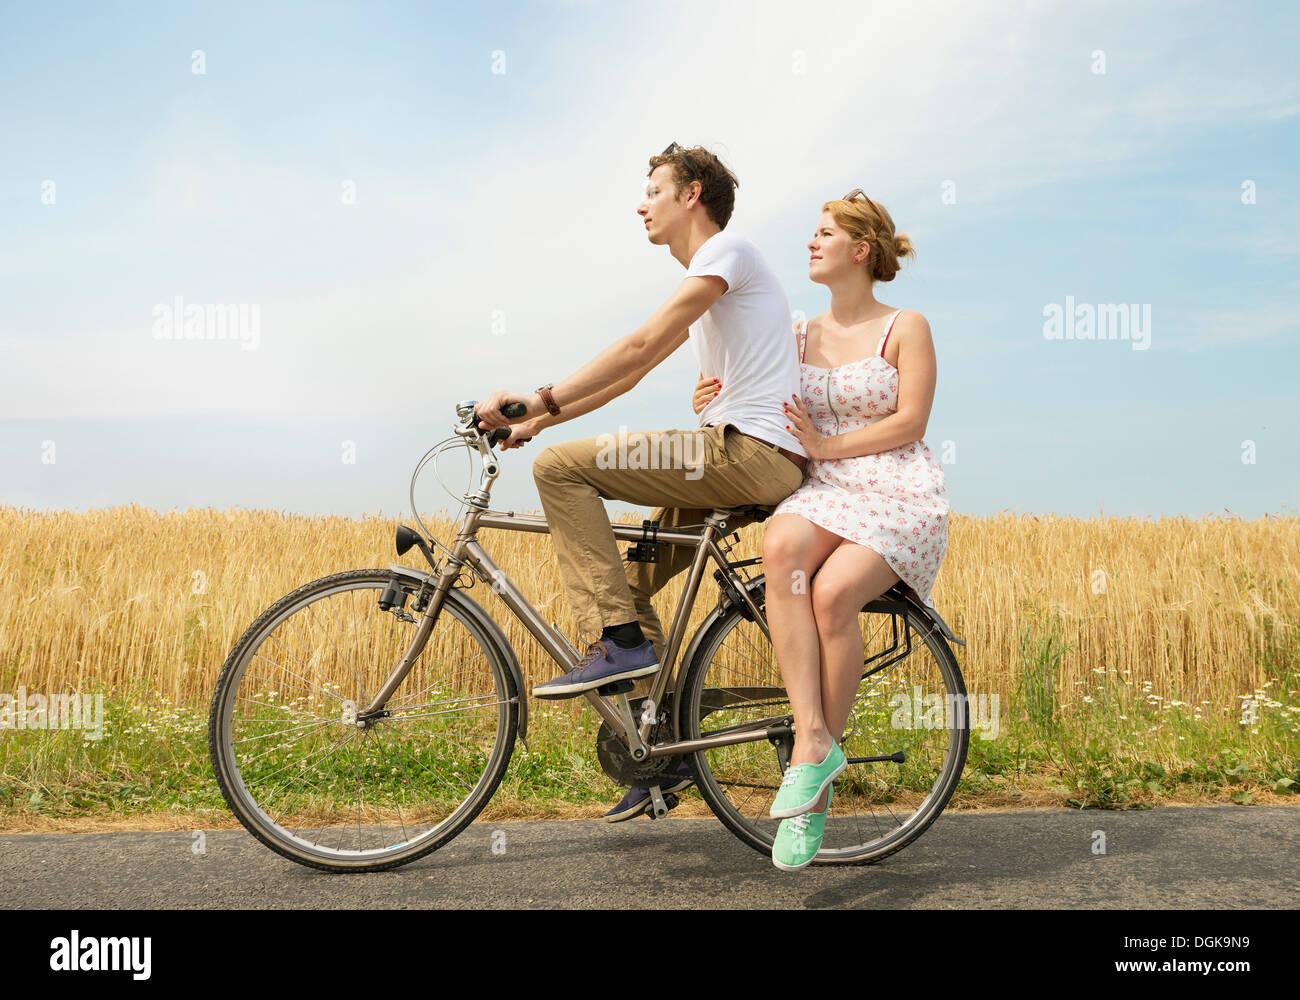 Par montando bicicleta Imagen De Stock